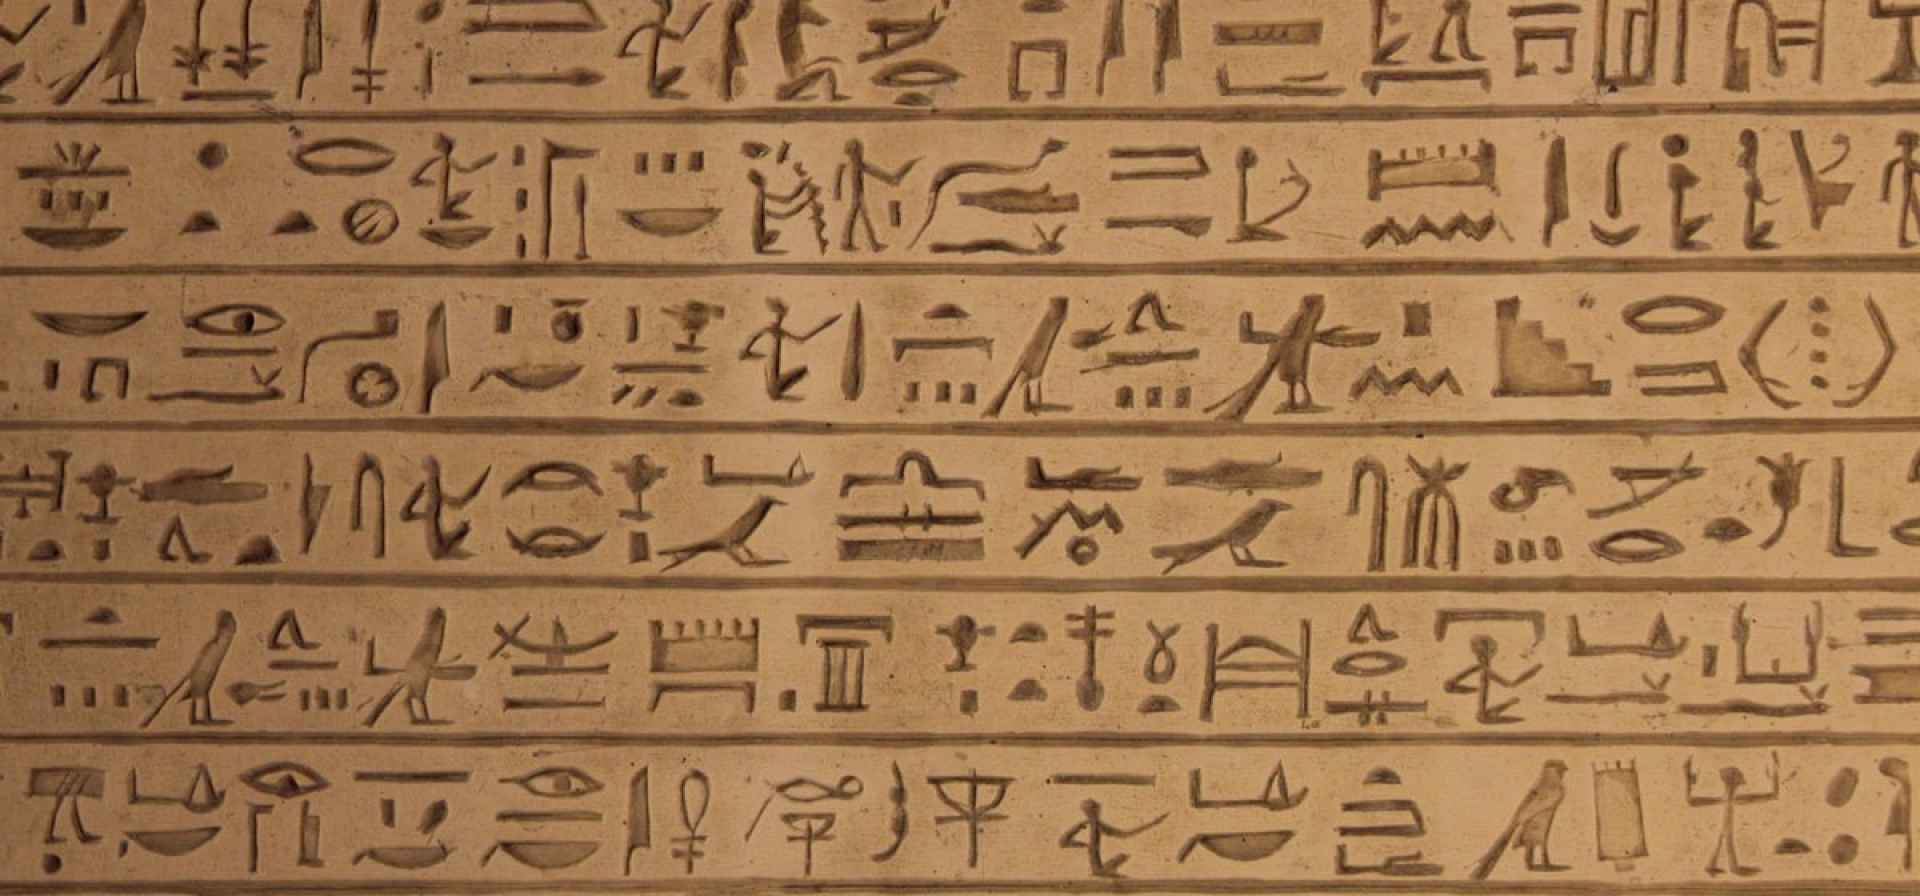 The Egyptian Hieroglyphic